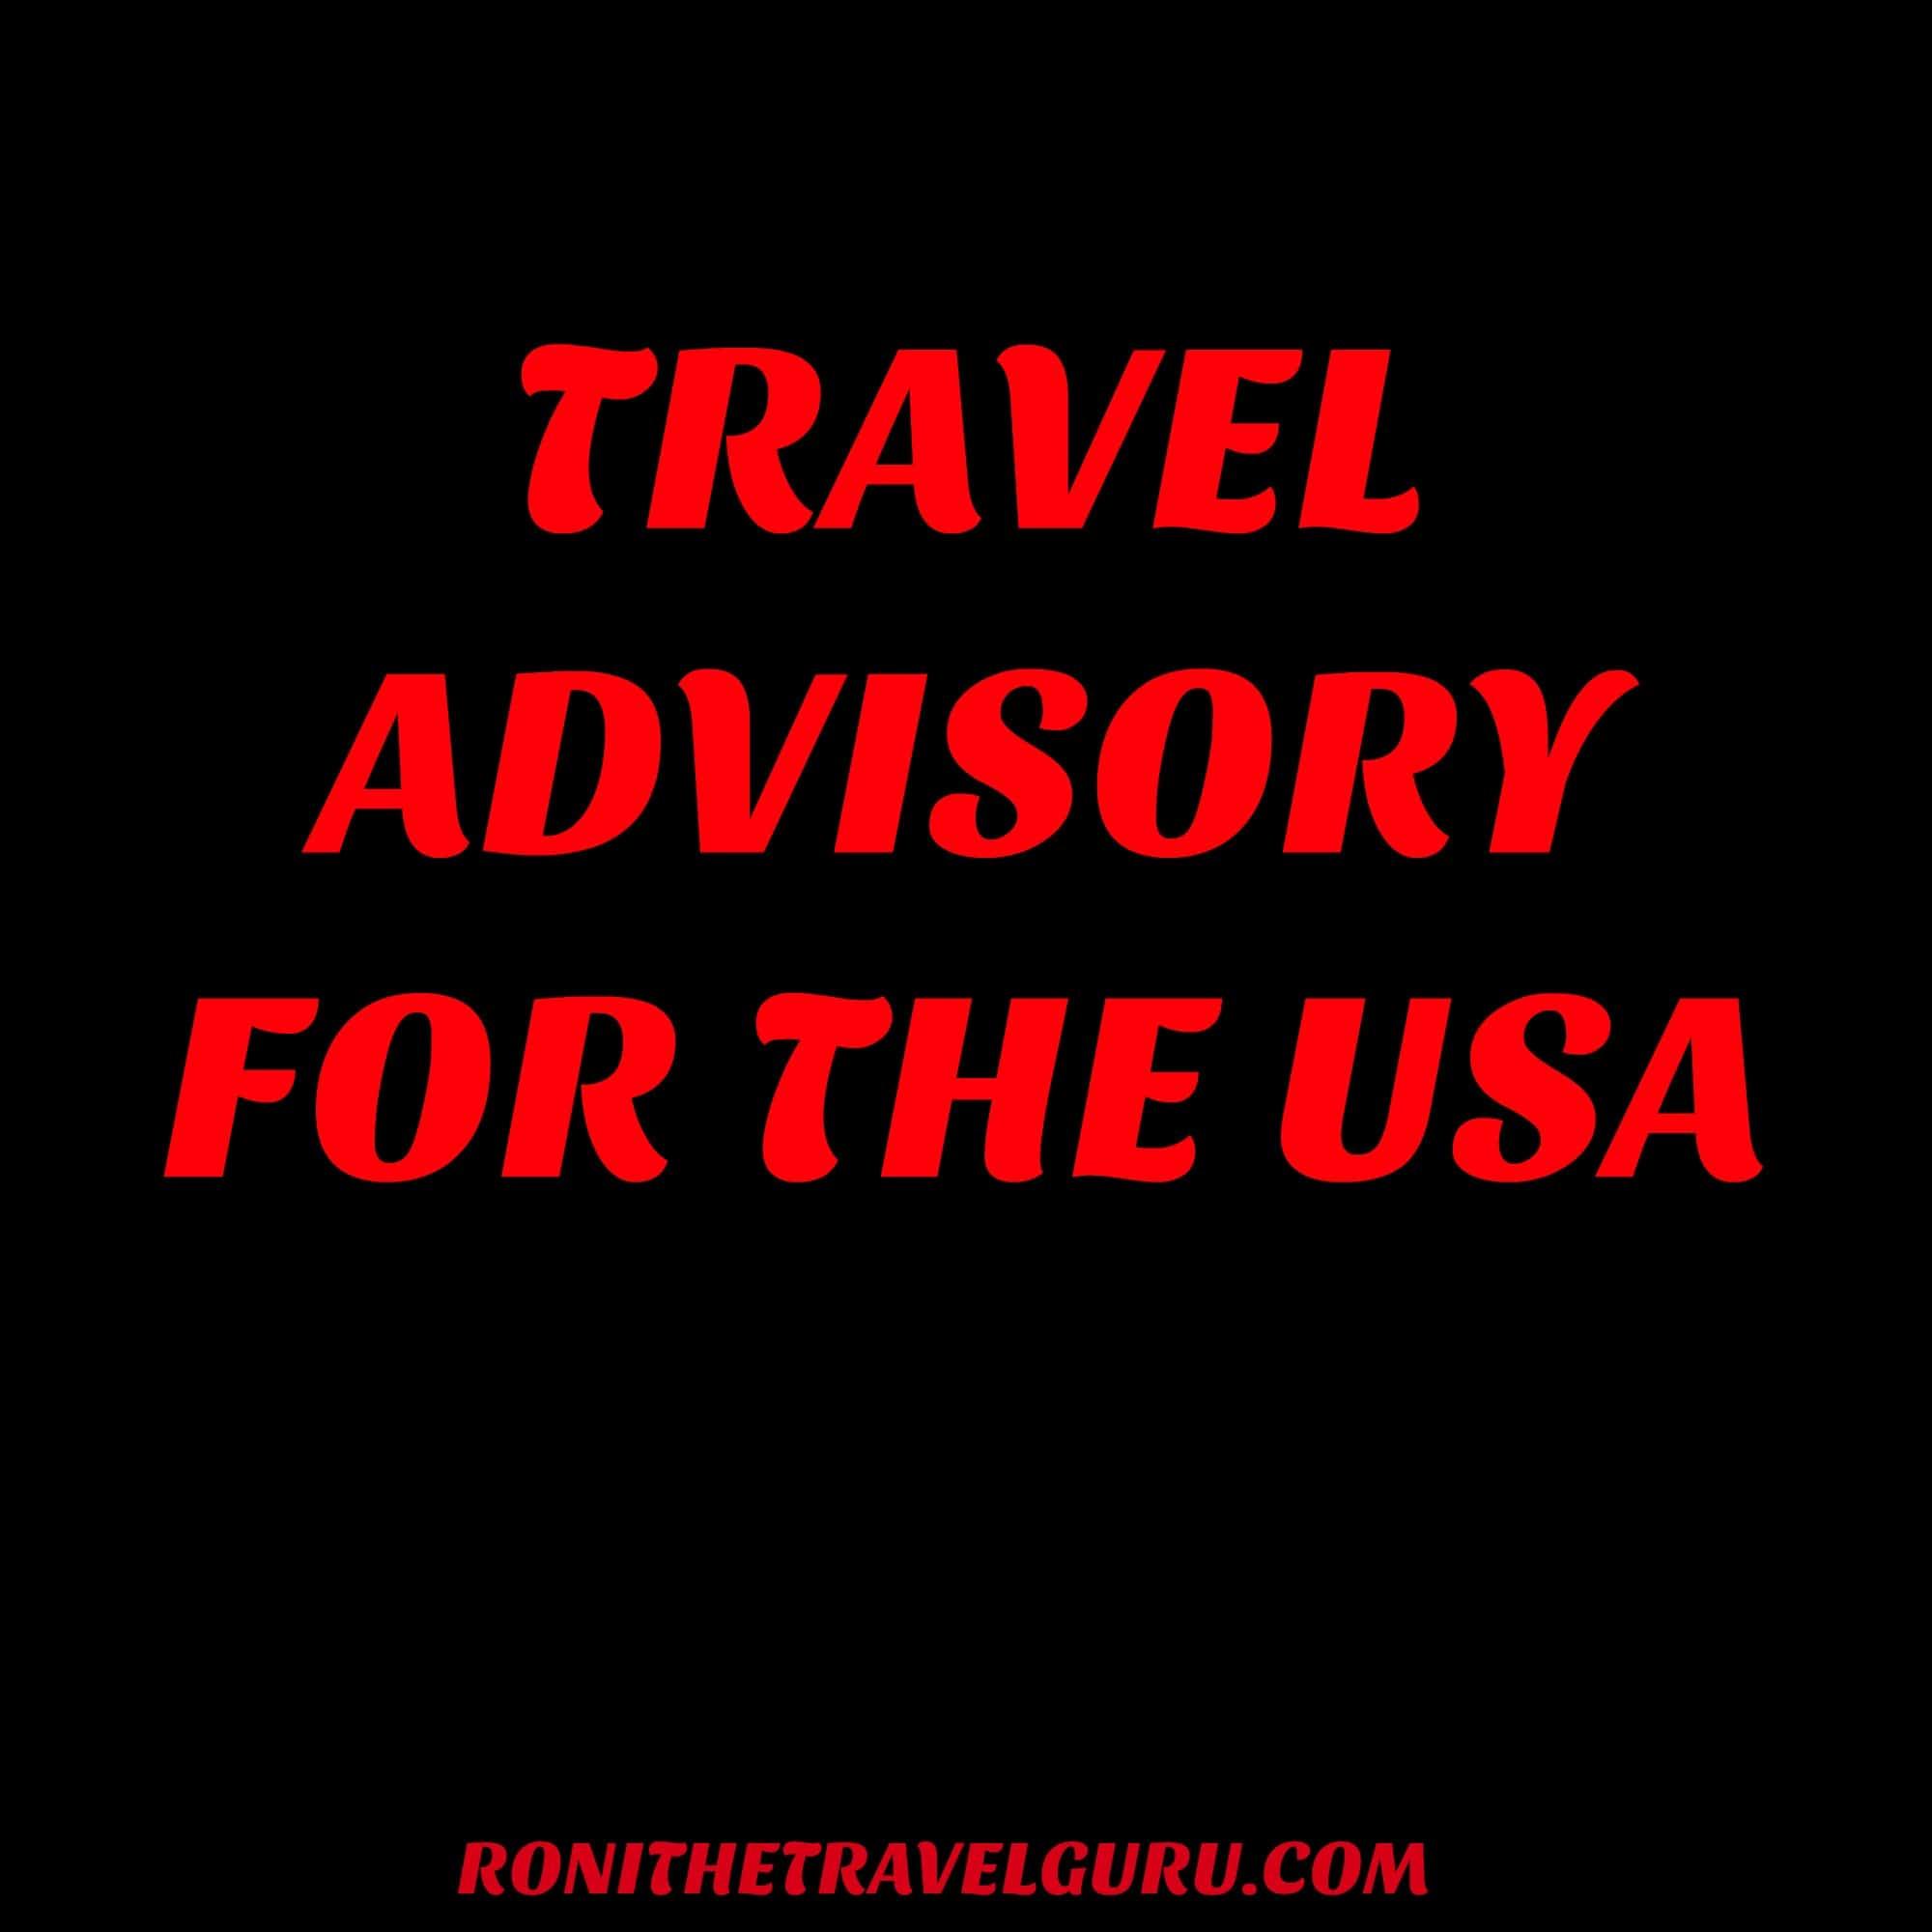 traveladvisory